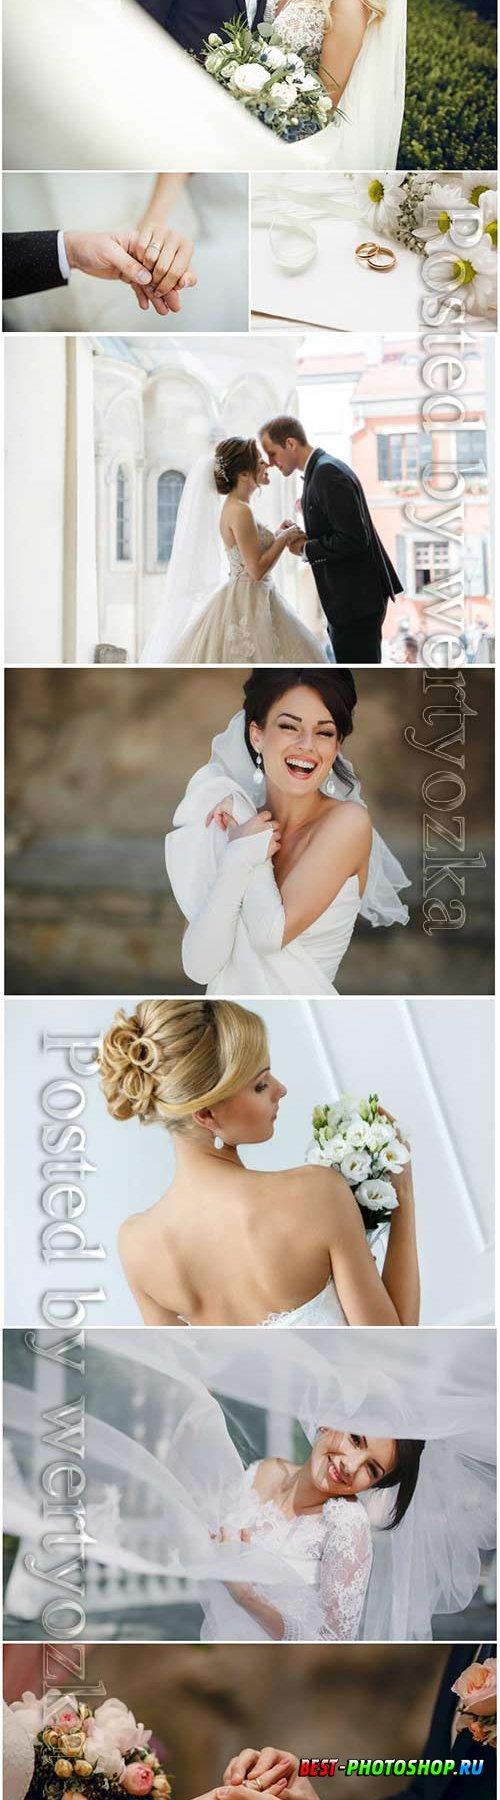 Bride and groom wedding stock photo